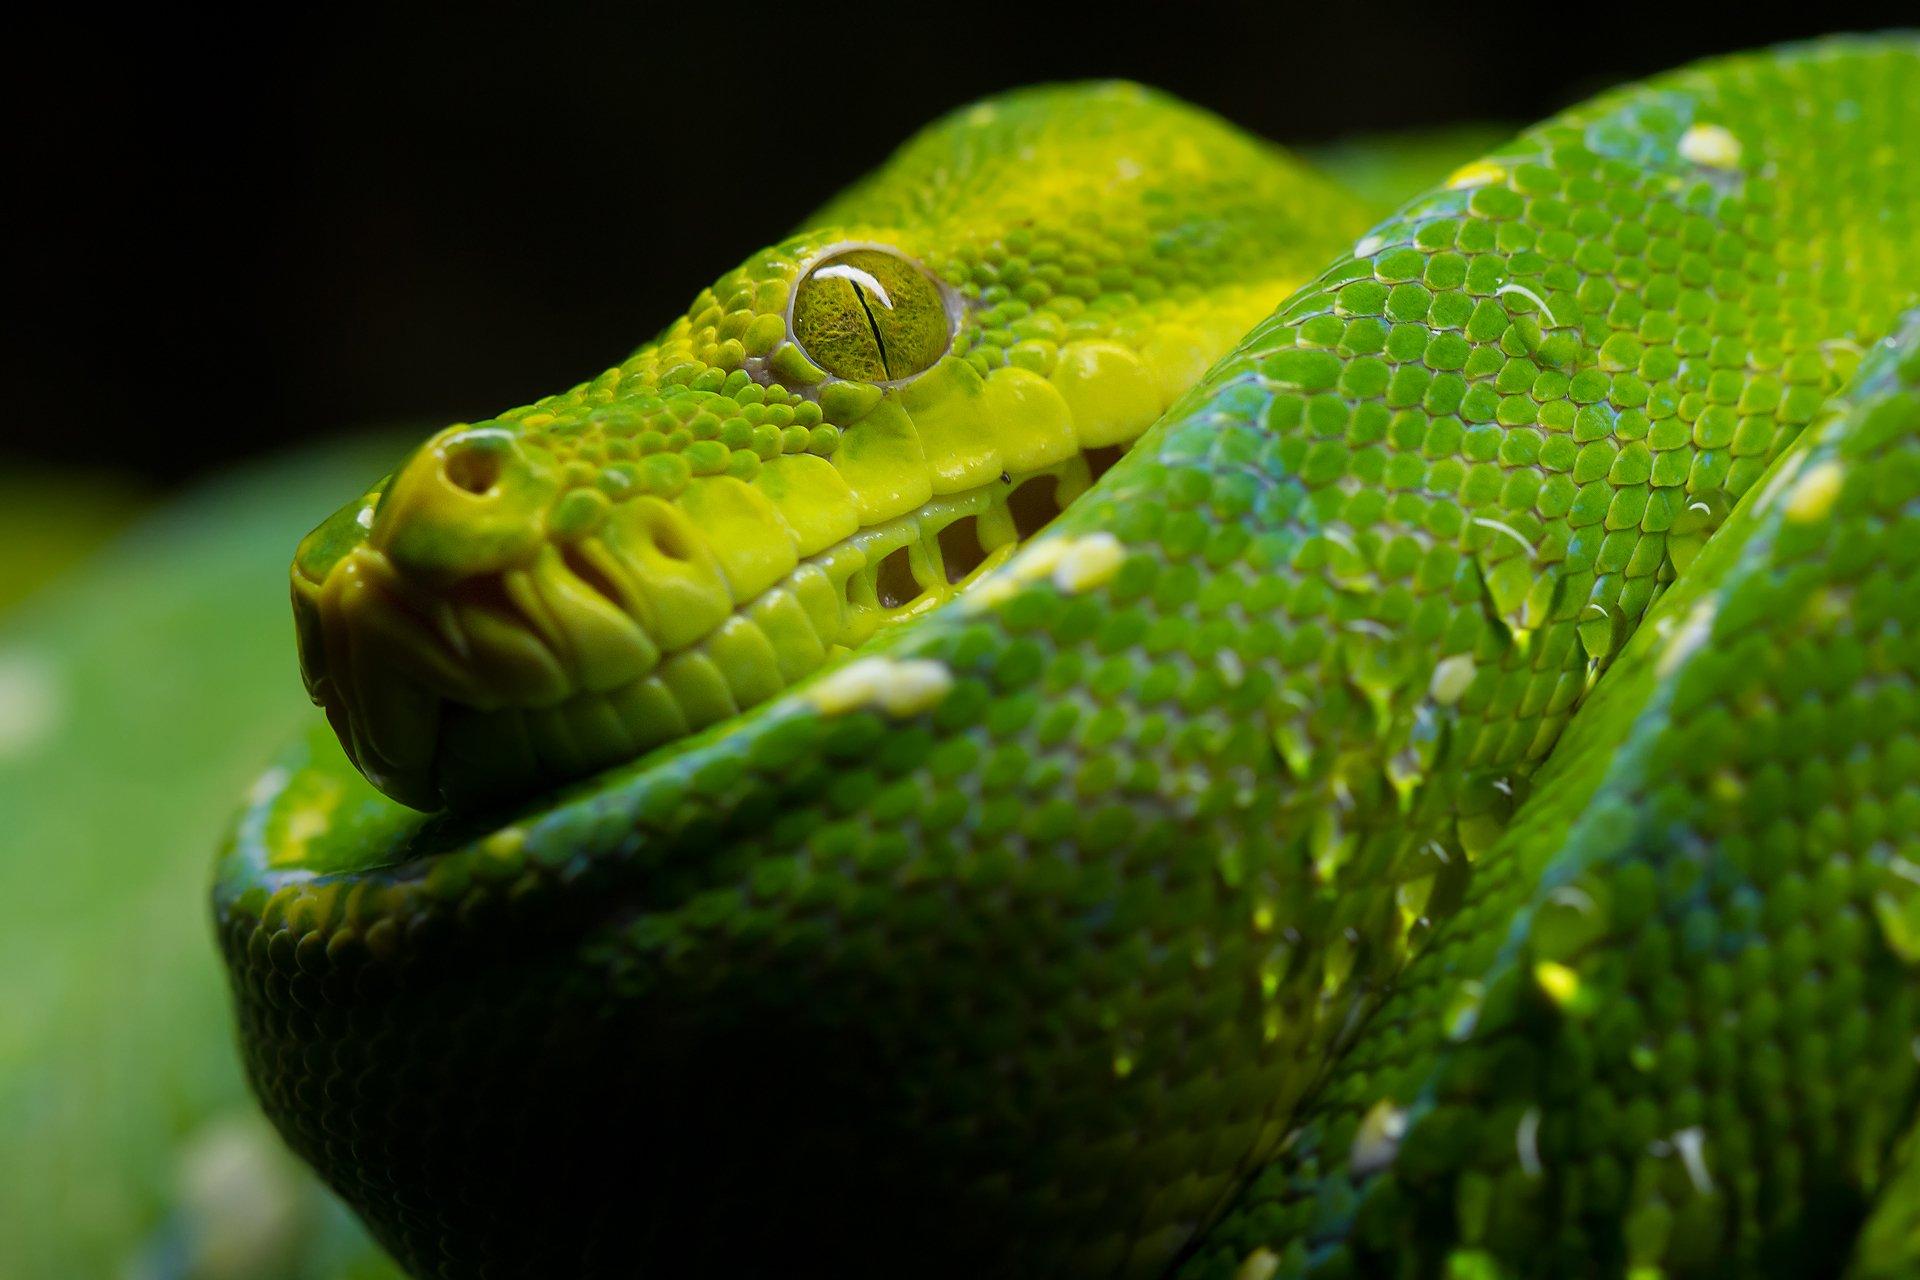 Snake HD Wallpaper | Background Image | 1920x1280 | ID ...